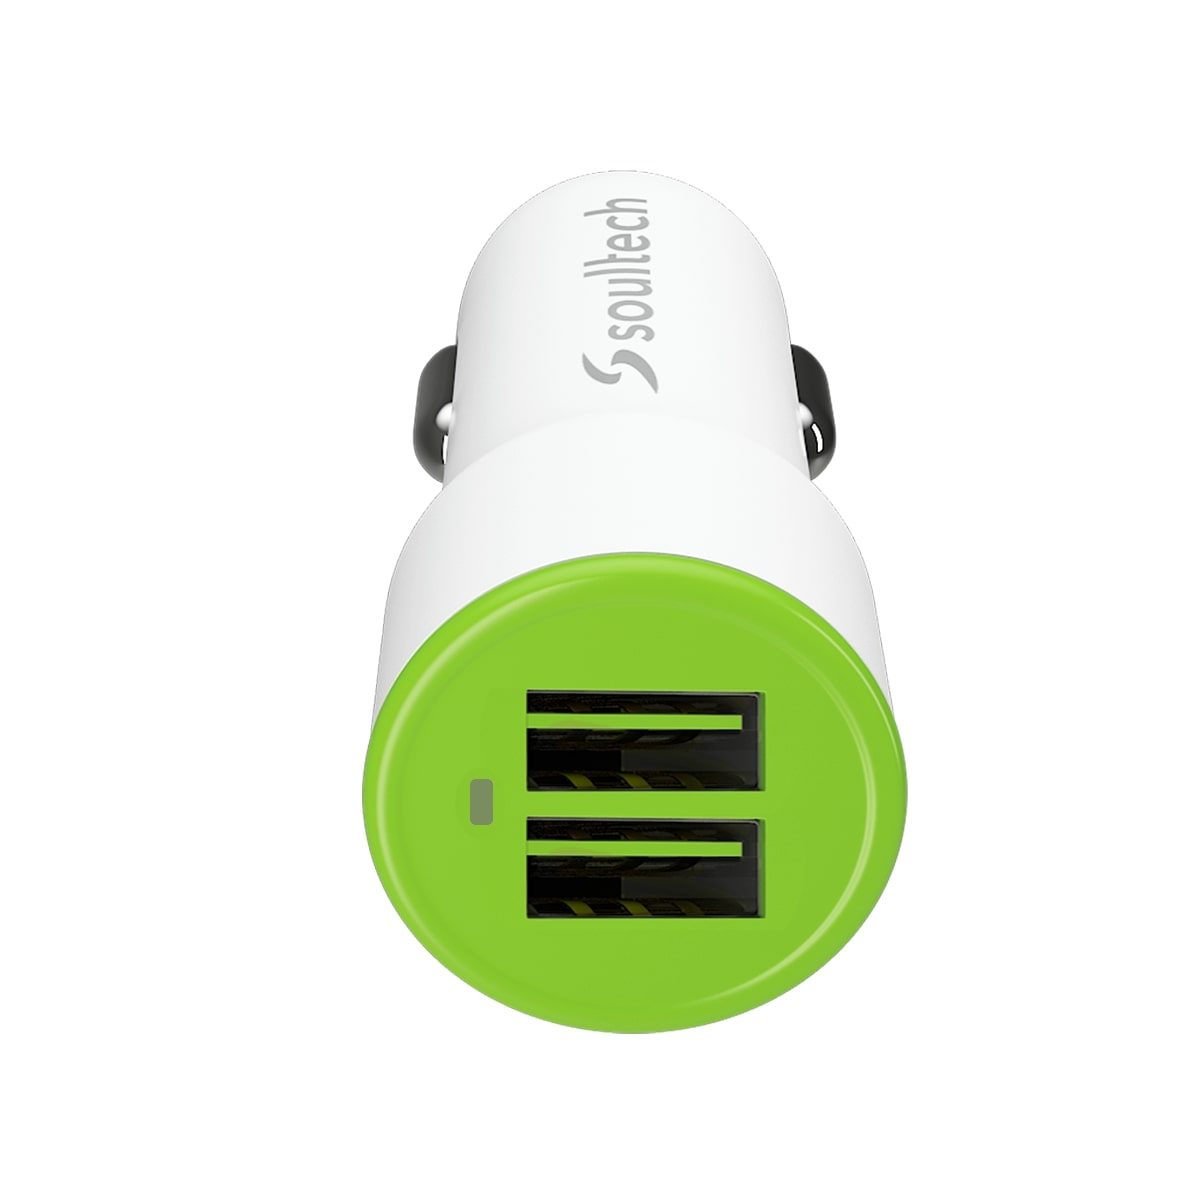 Soultech Comfort Micro 2 Usb Araç Şarjı + Kablo SC344B  3.1 MAH  Beyaz